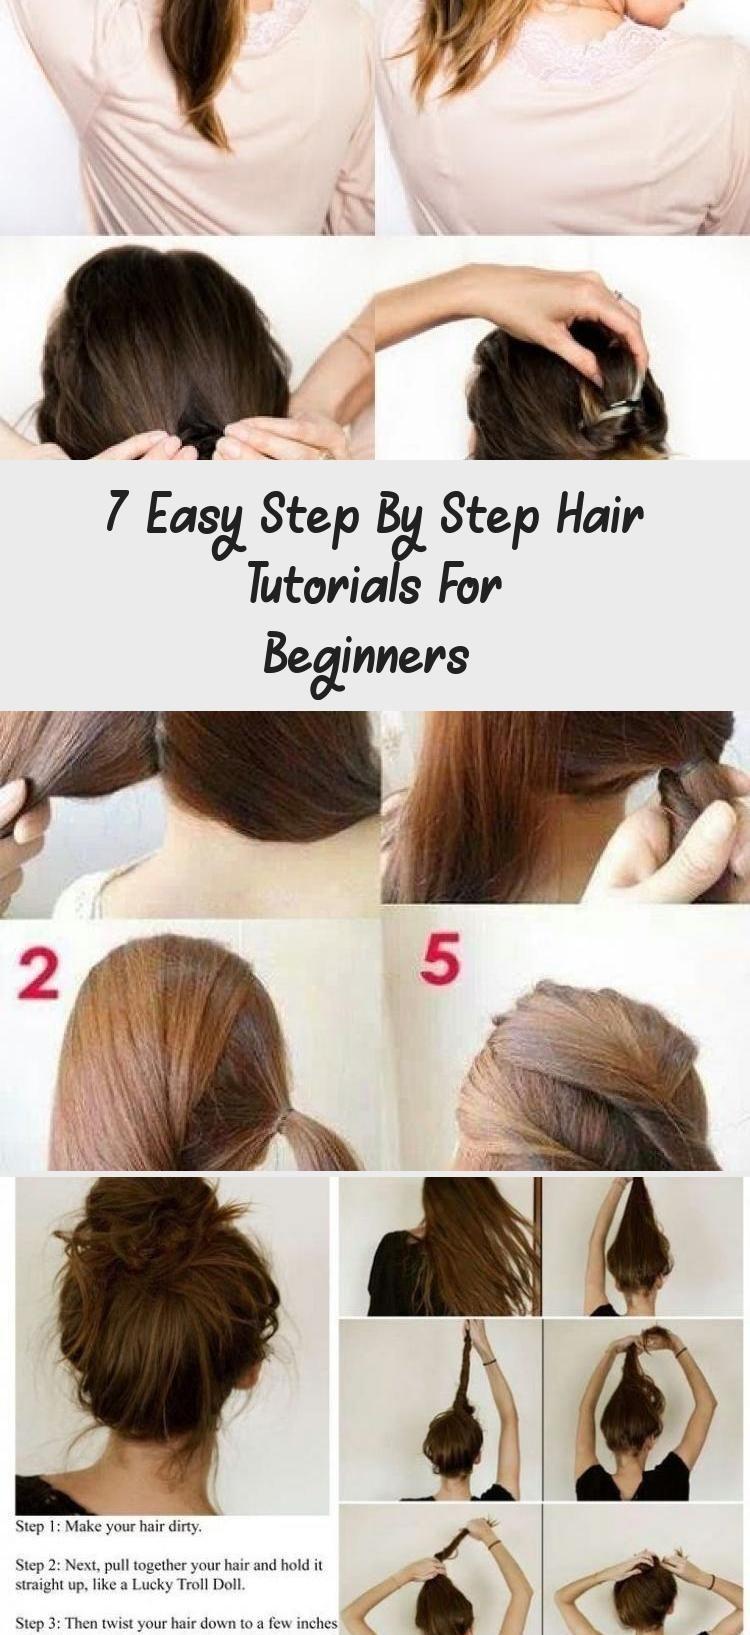 7 Easy Step By Step Hair Tutorials For Beginners Hairstyles Hair Tutorial Cool Easy Hairstyles Hair Videos Tutorials